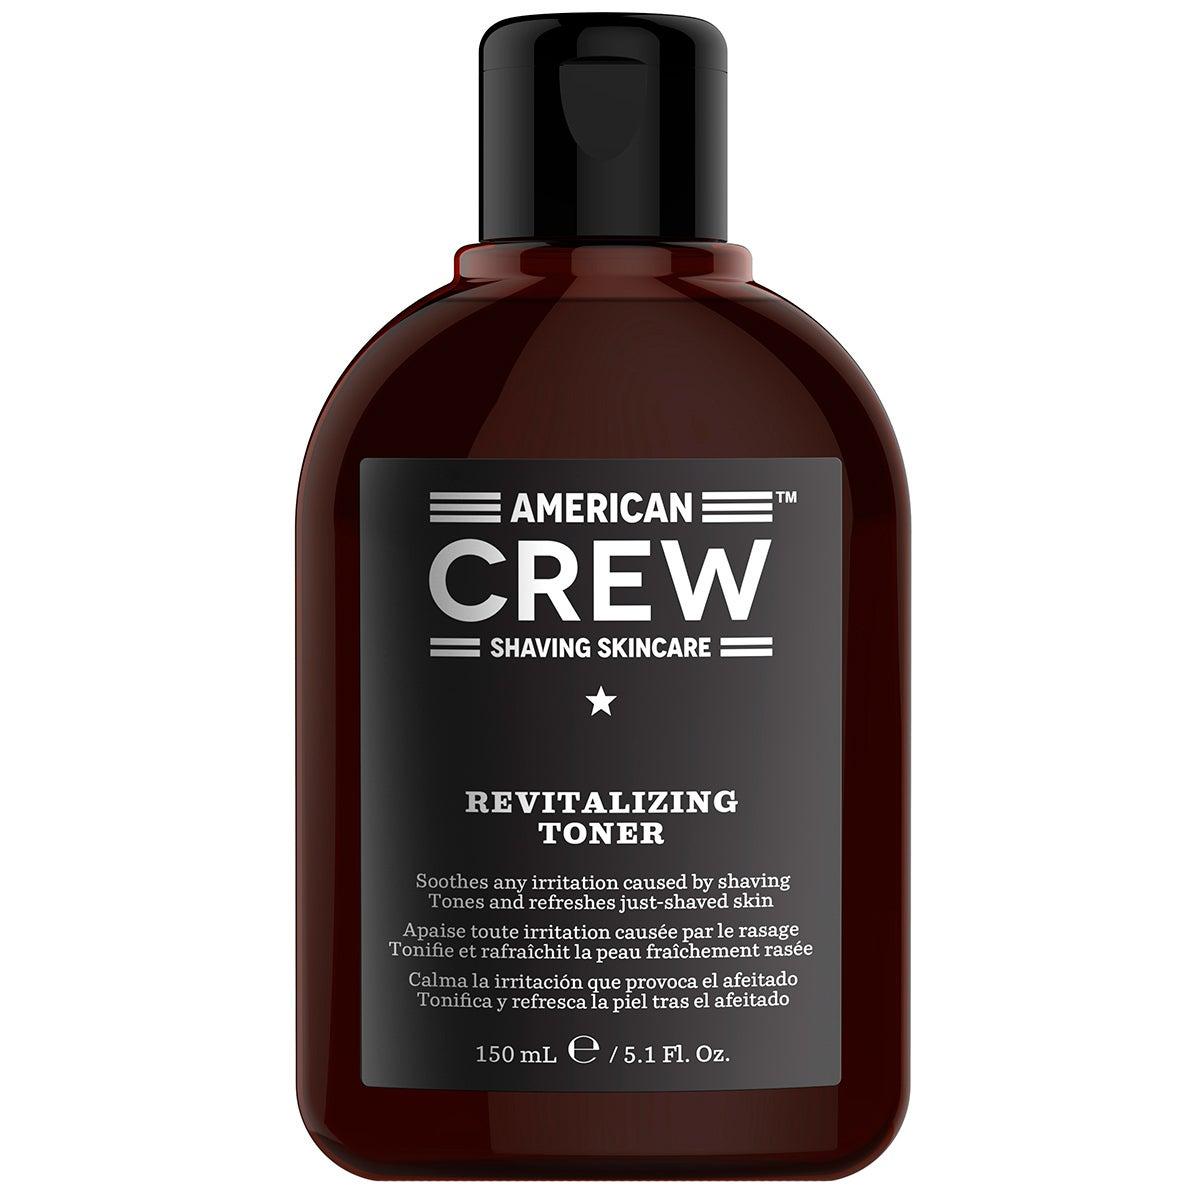 Shaving Skincare Revitalizing Toner 150 ml American Crew Efter rakning